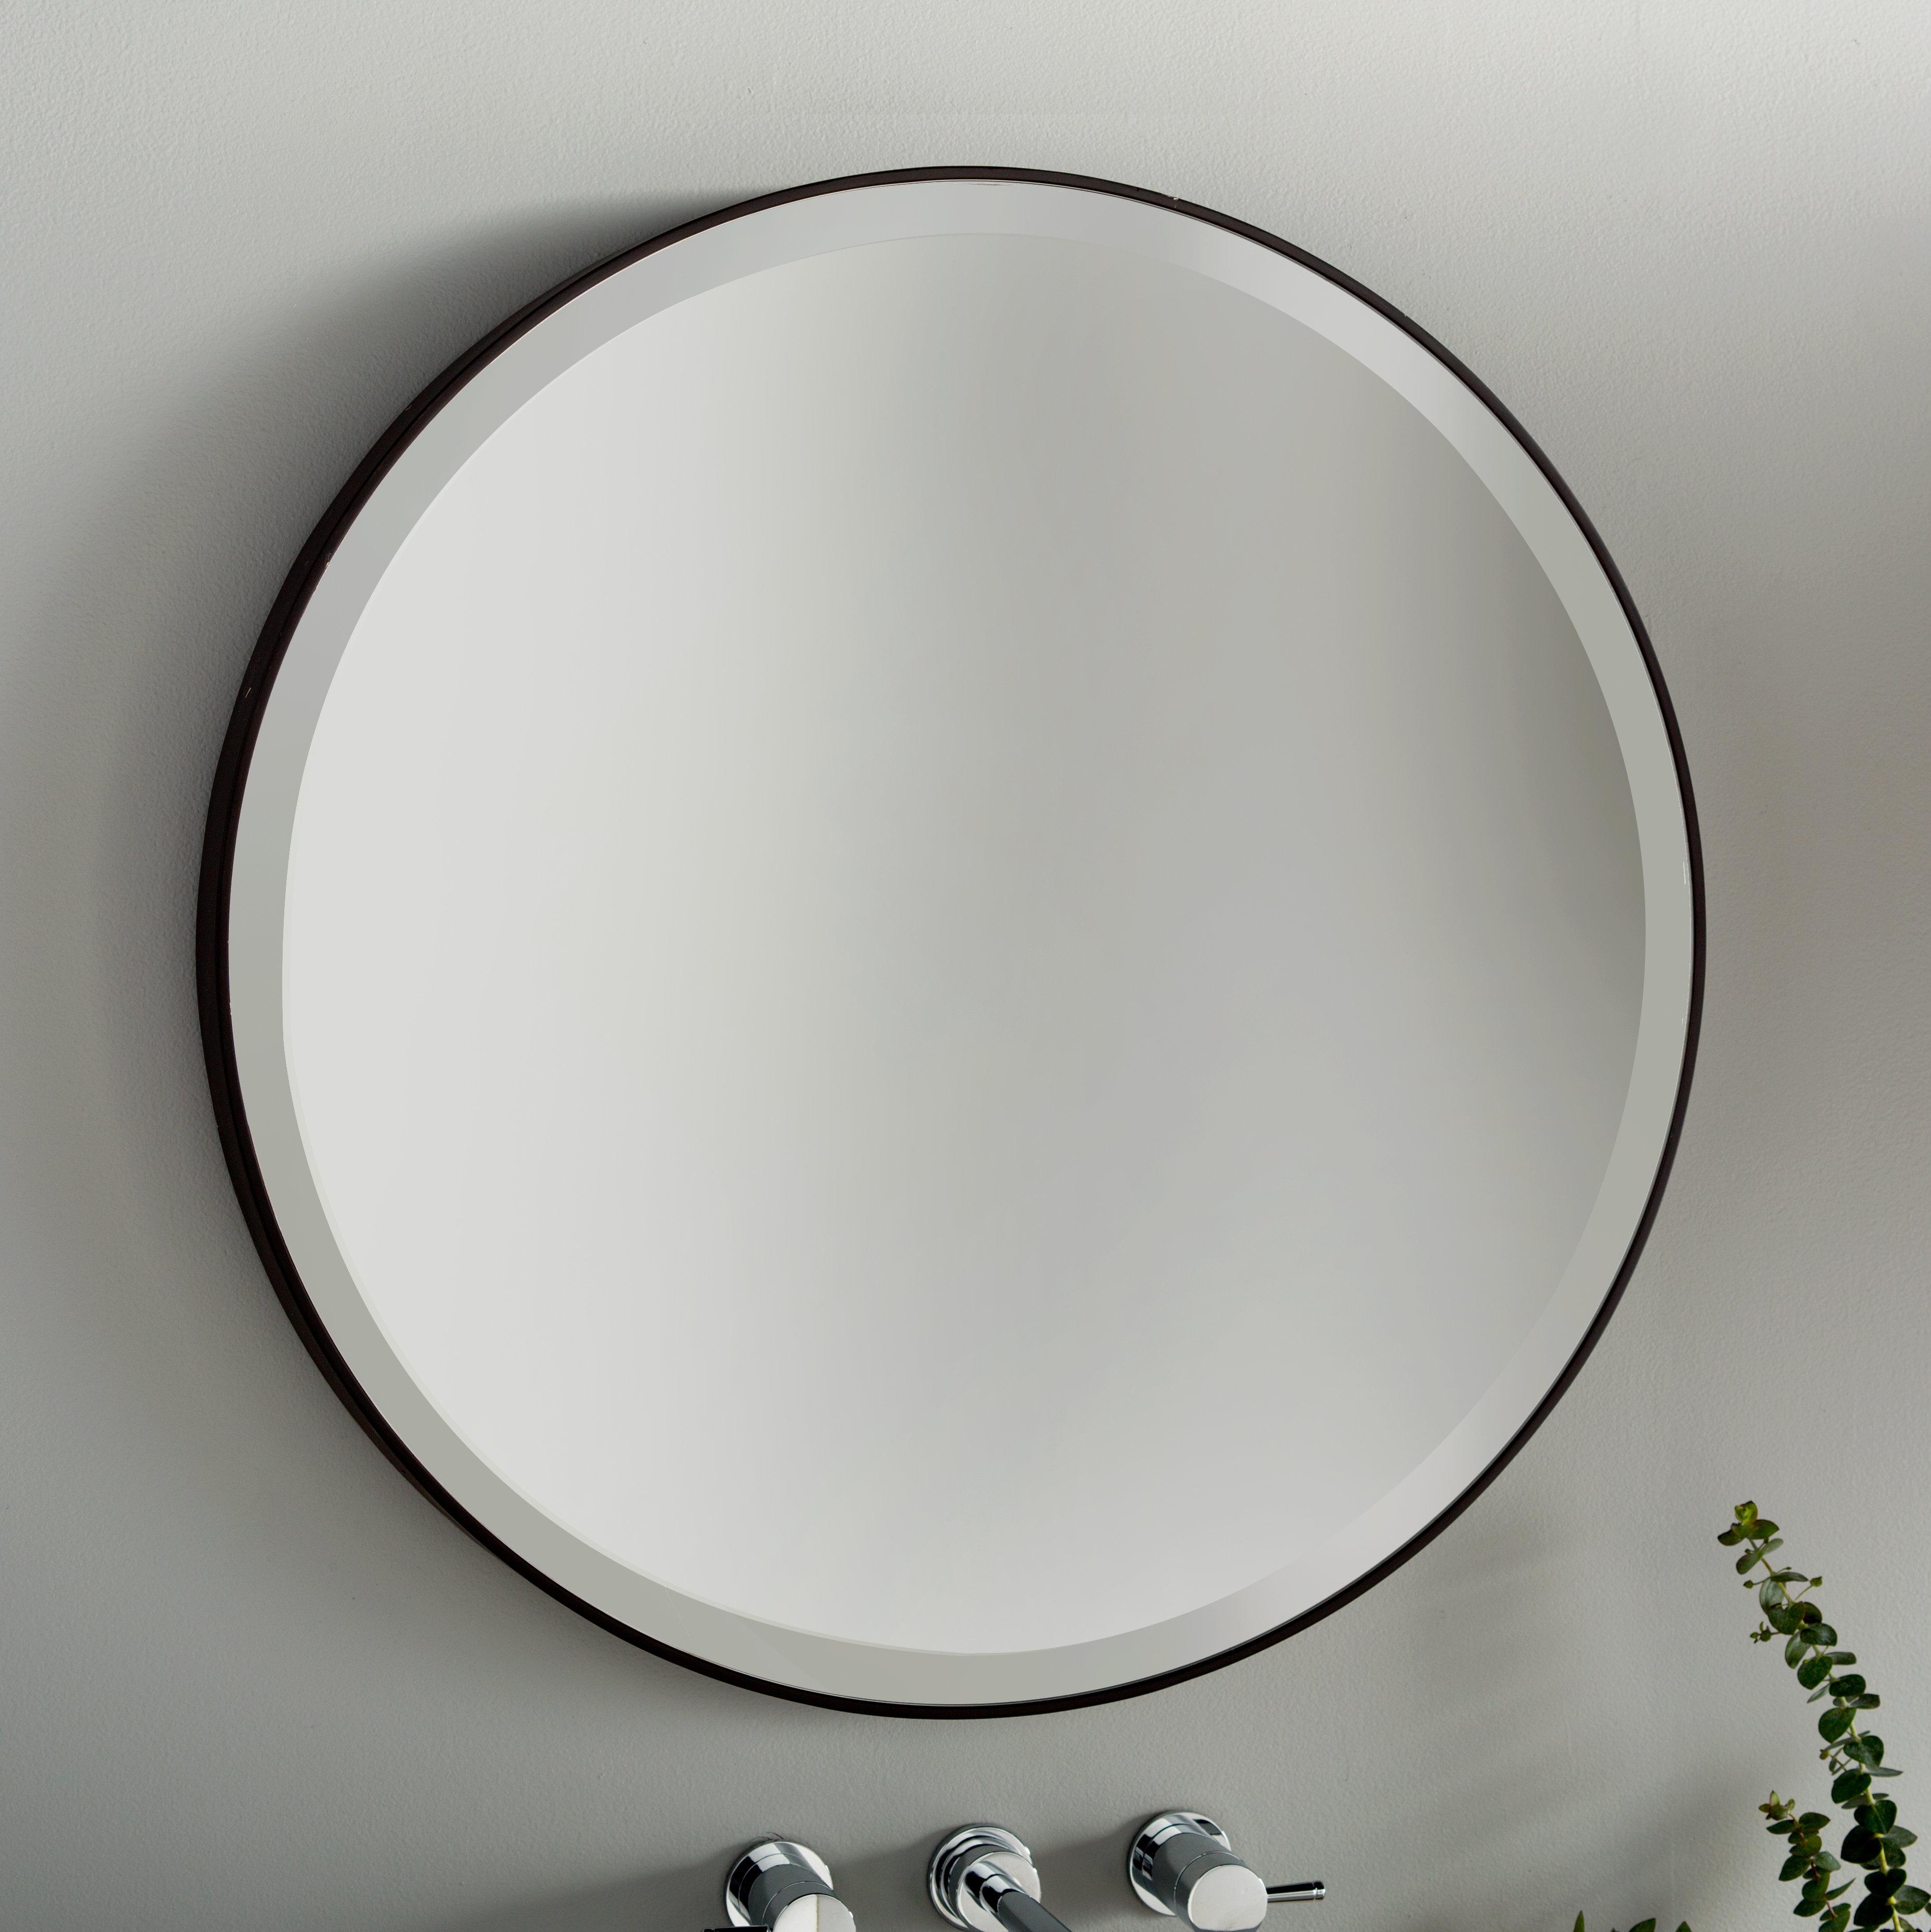 Modern & Contemporary Diamond Wall Mirror | Allmodern In Traditional Frameless Diamond Wall Mirrors (Image 14 of 20)